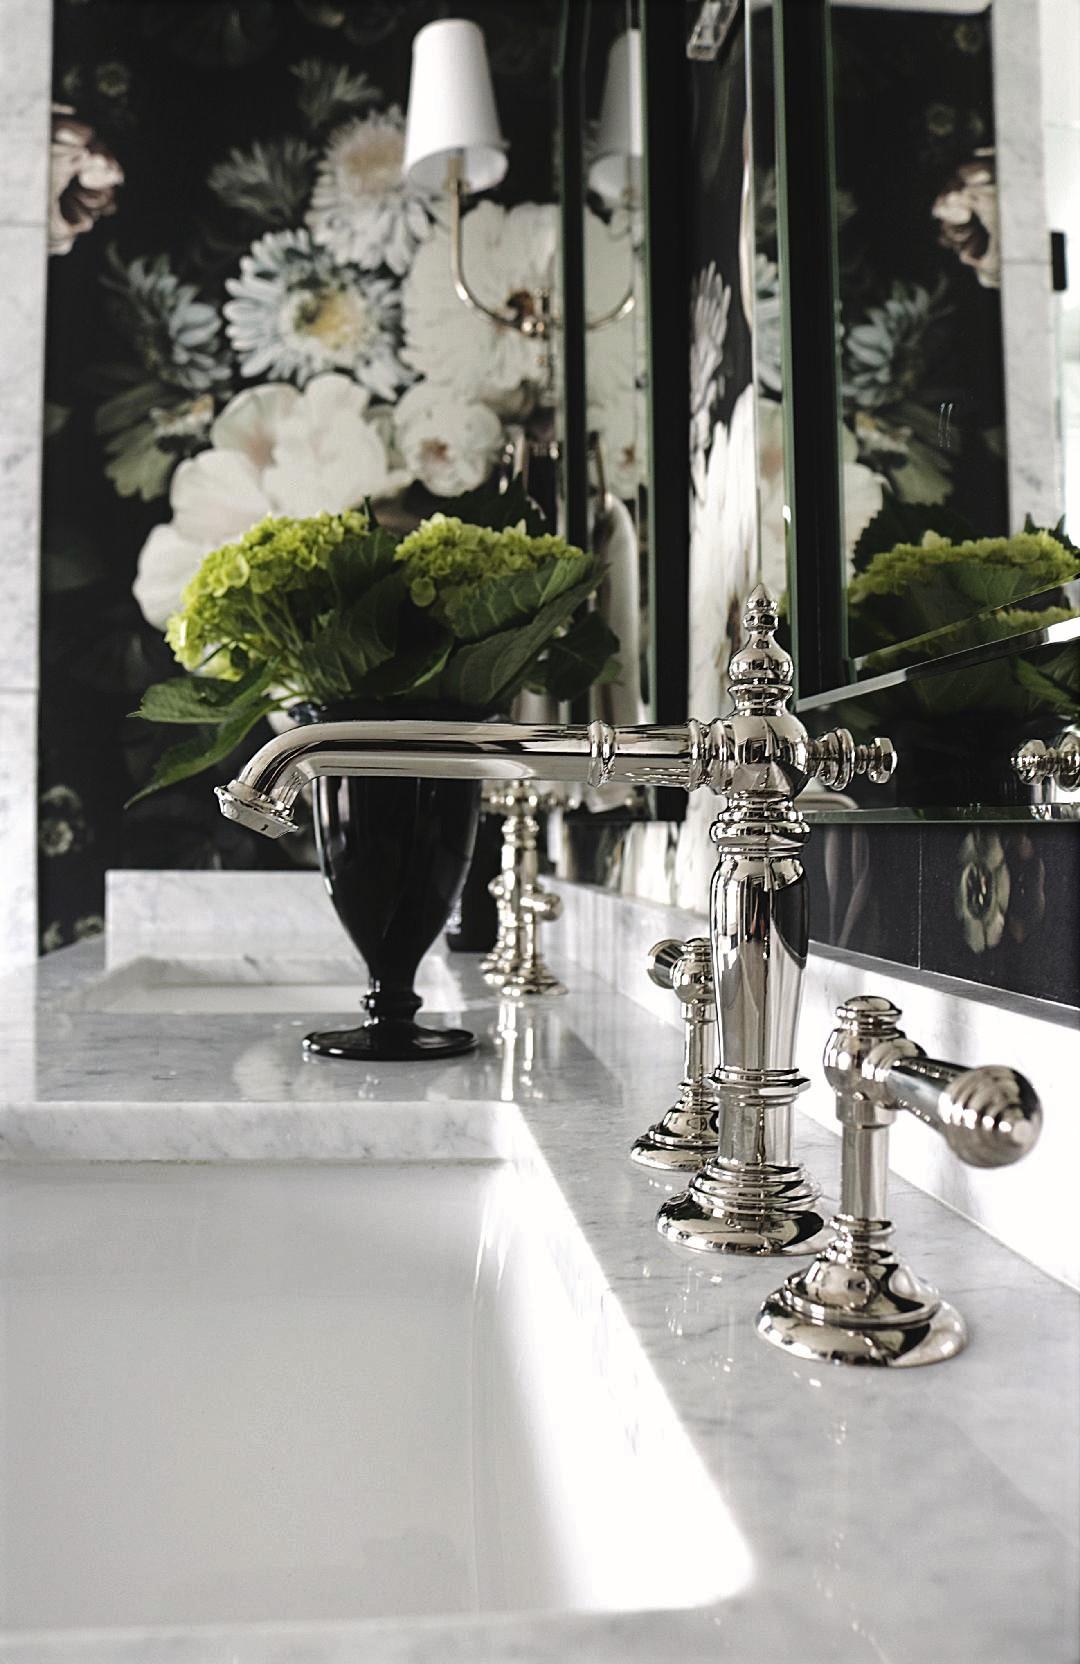 Kelle Dame Interiors Artifacts Faucet Ellie Cashman Wallpaper.jpg